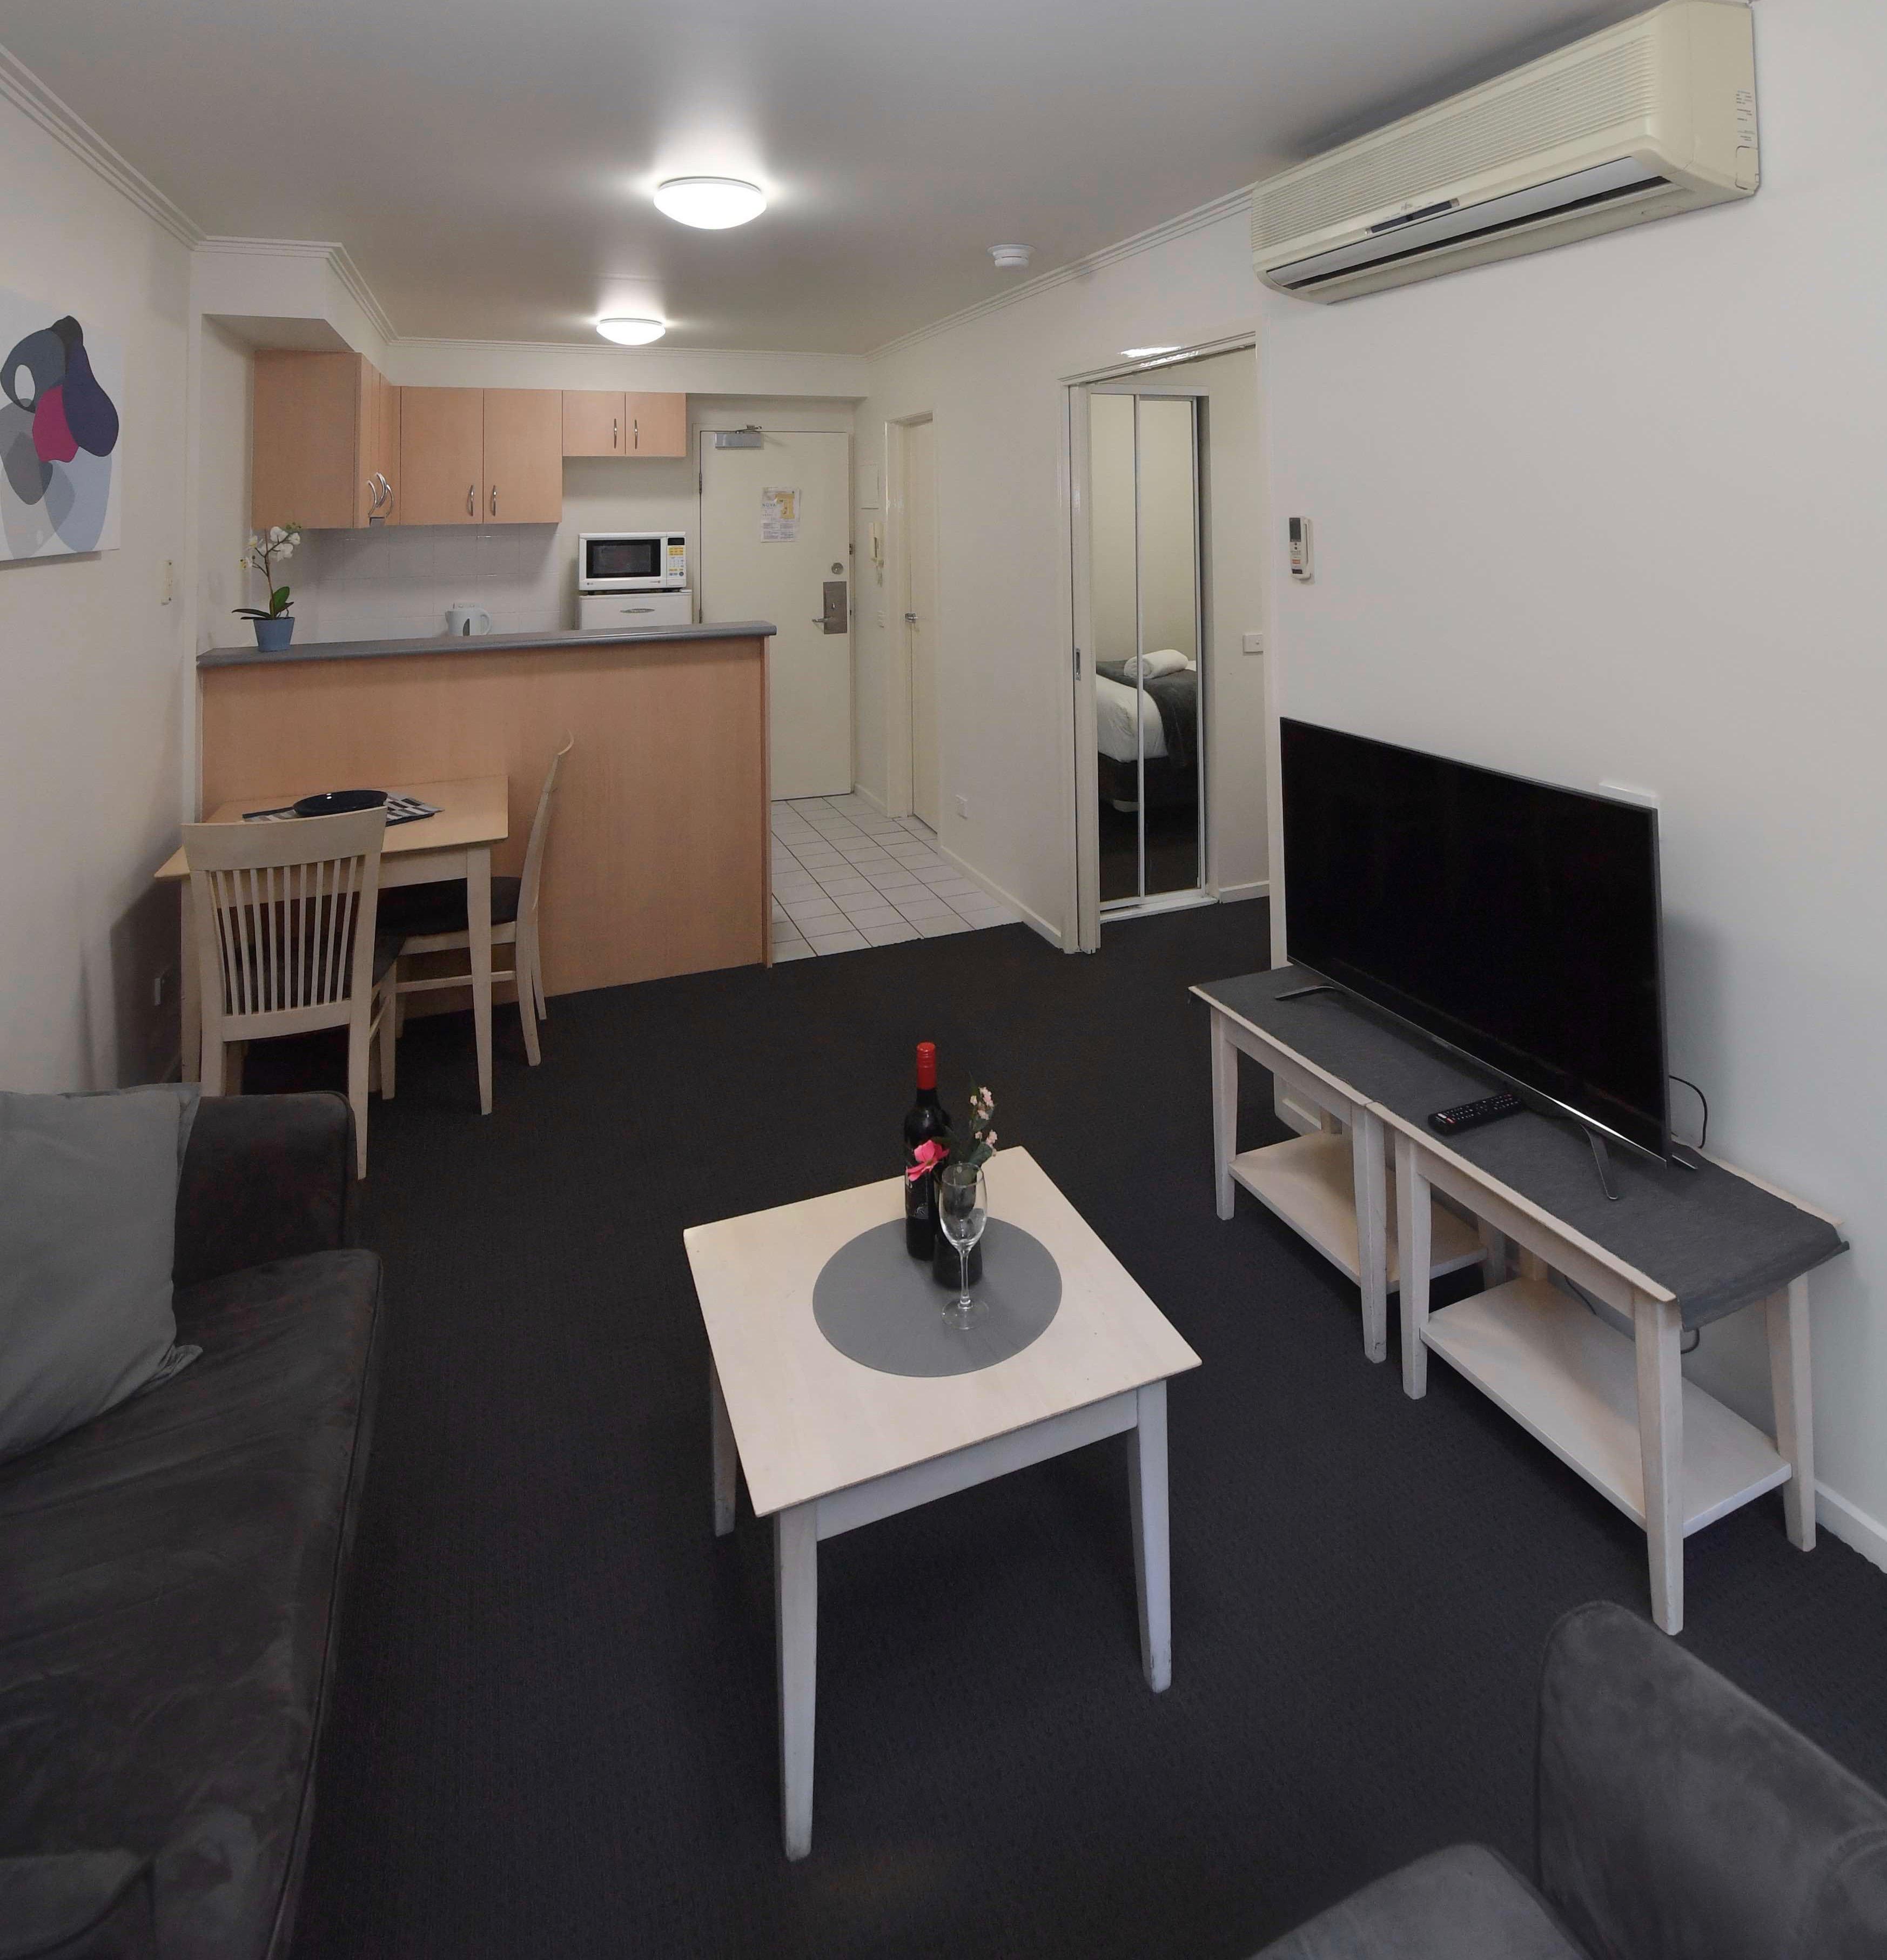 Adara Franklin - 2-Bedroom-superiorLiving Area